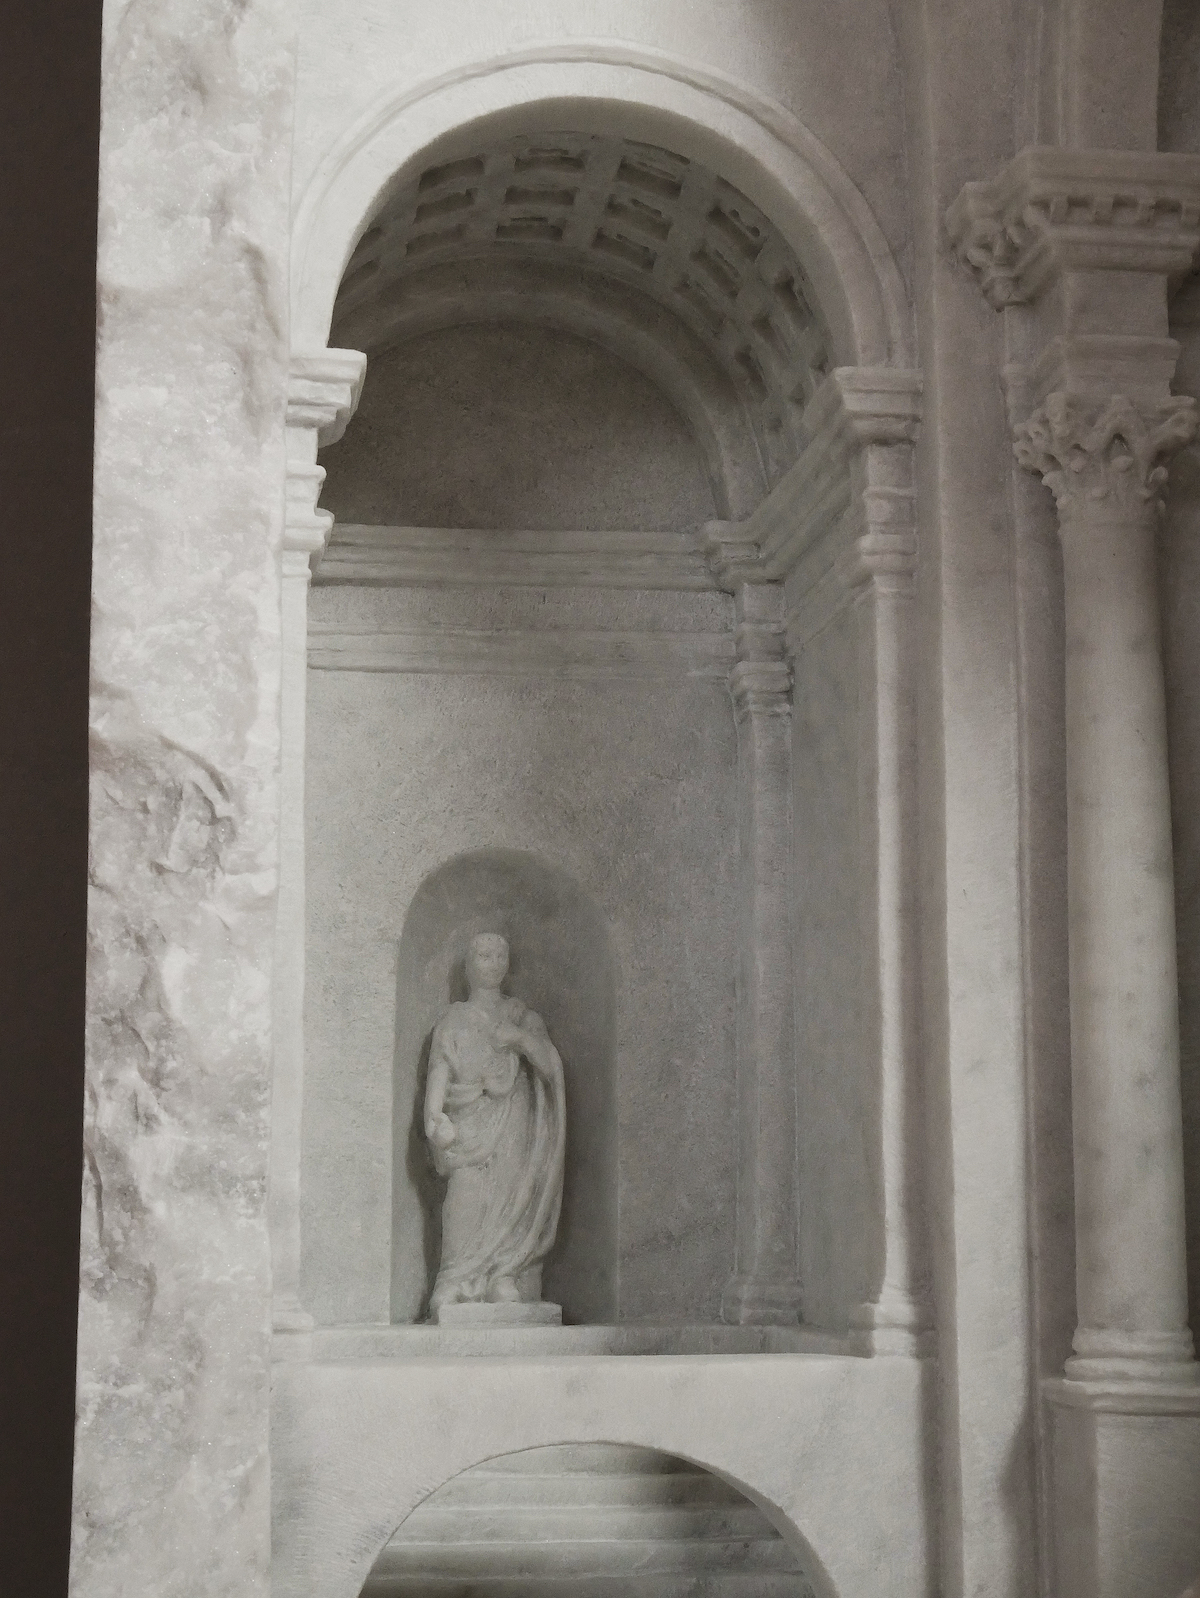 Interior Carving